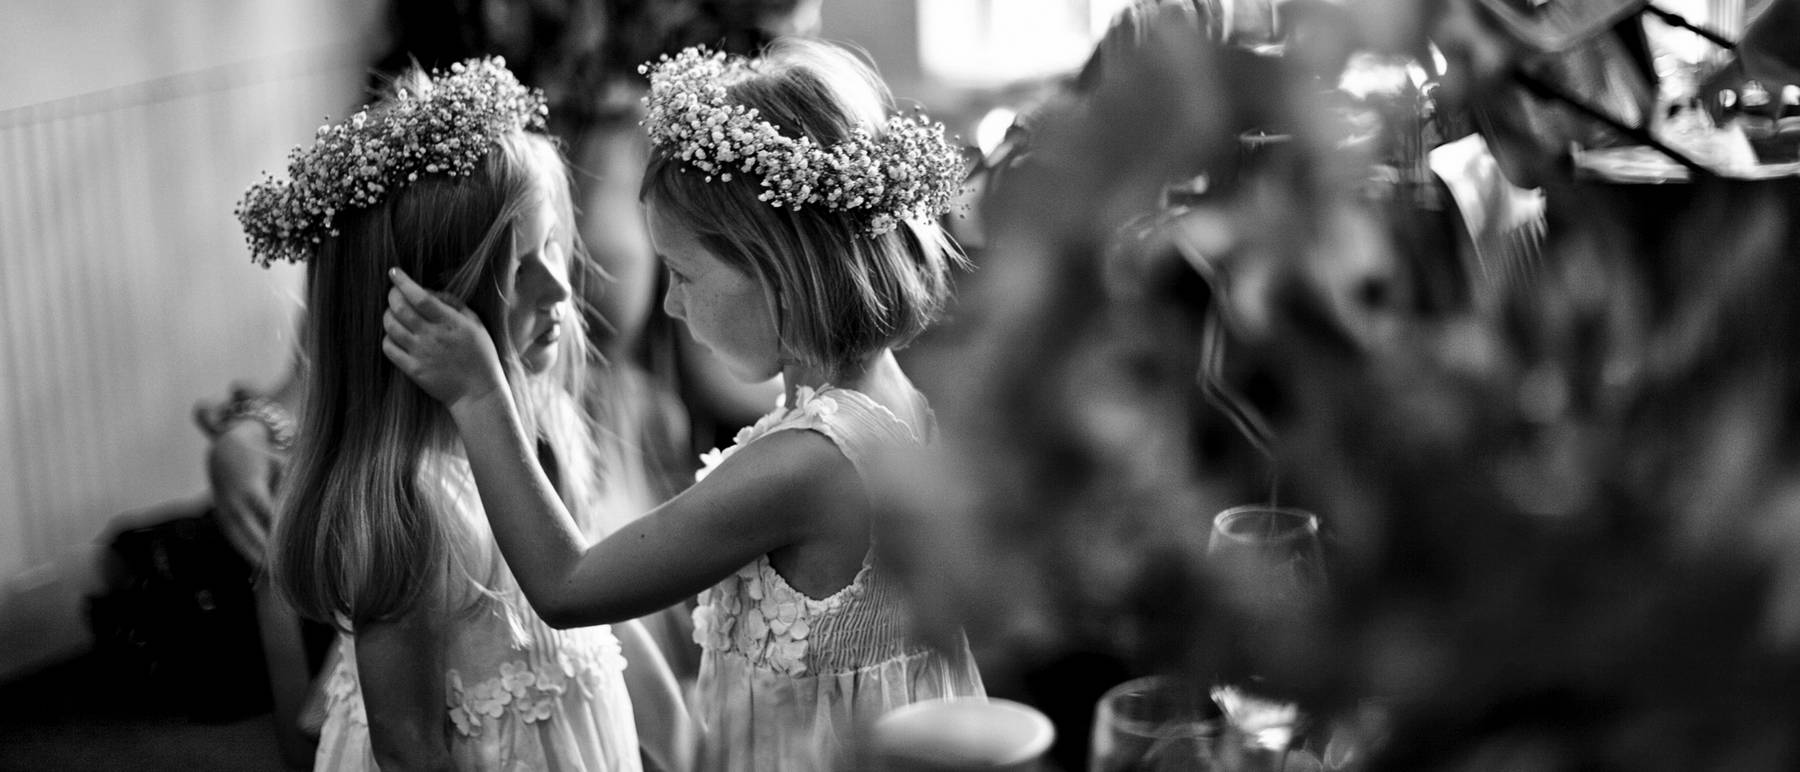 johnandjoseph-wedding-photographer-hz-slider-171